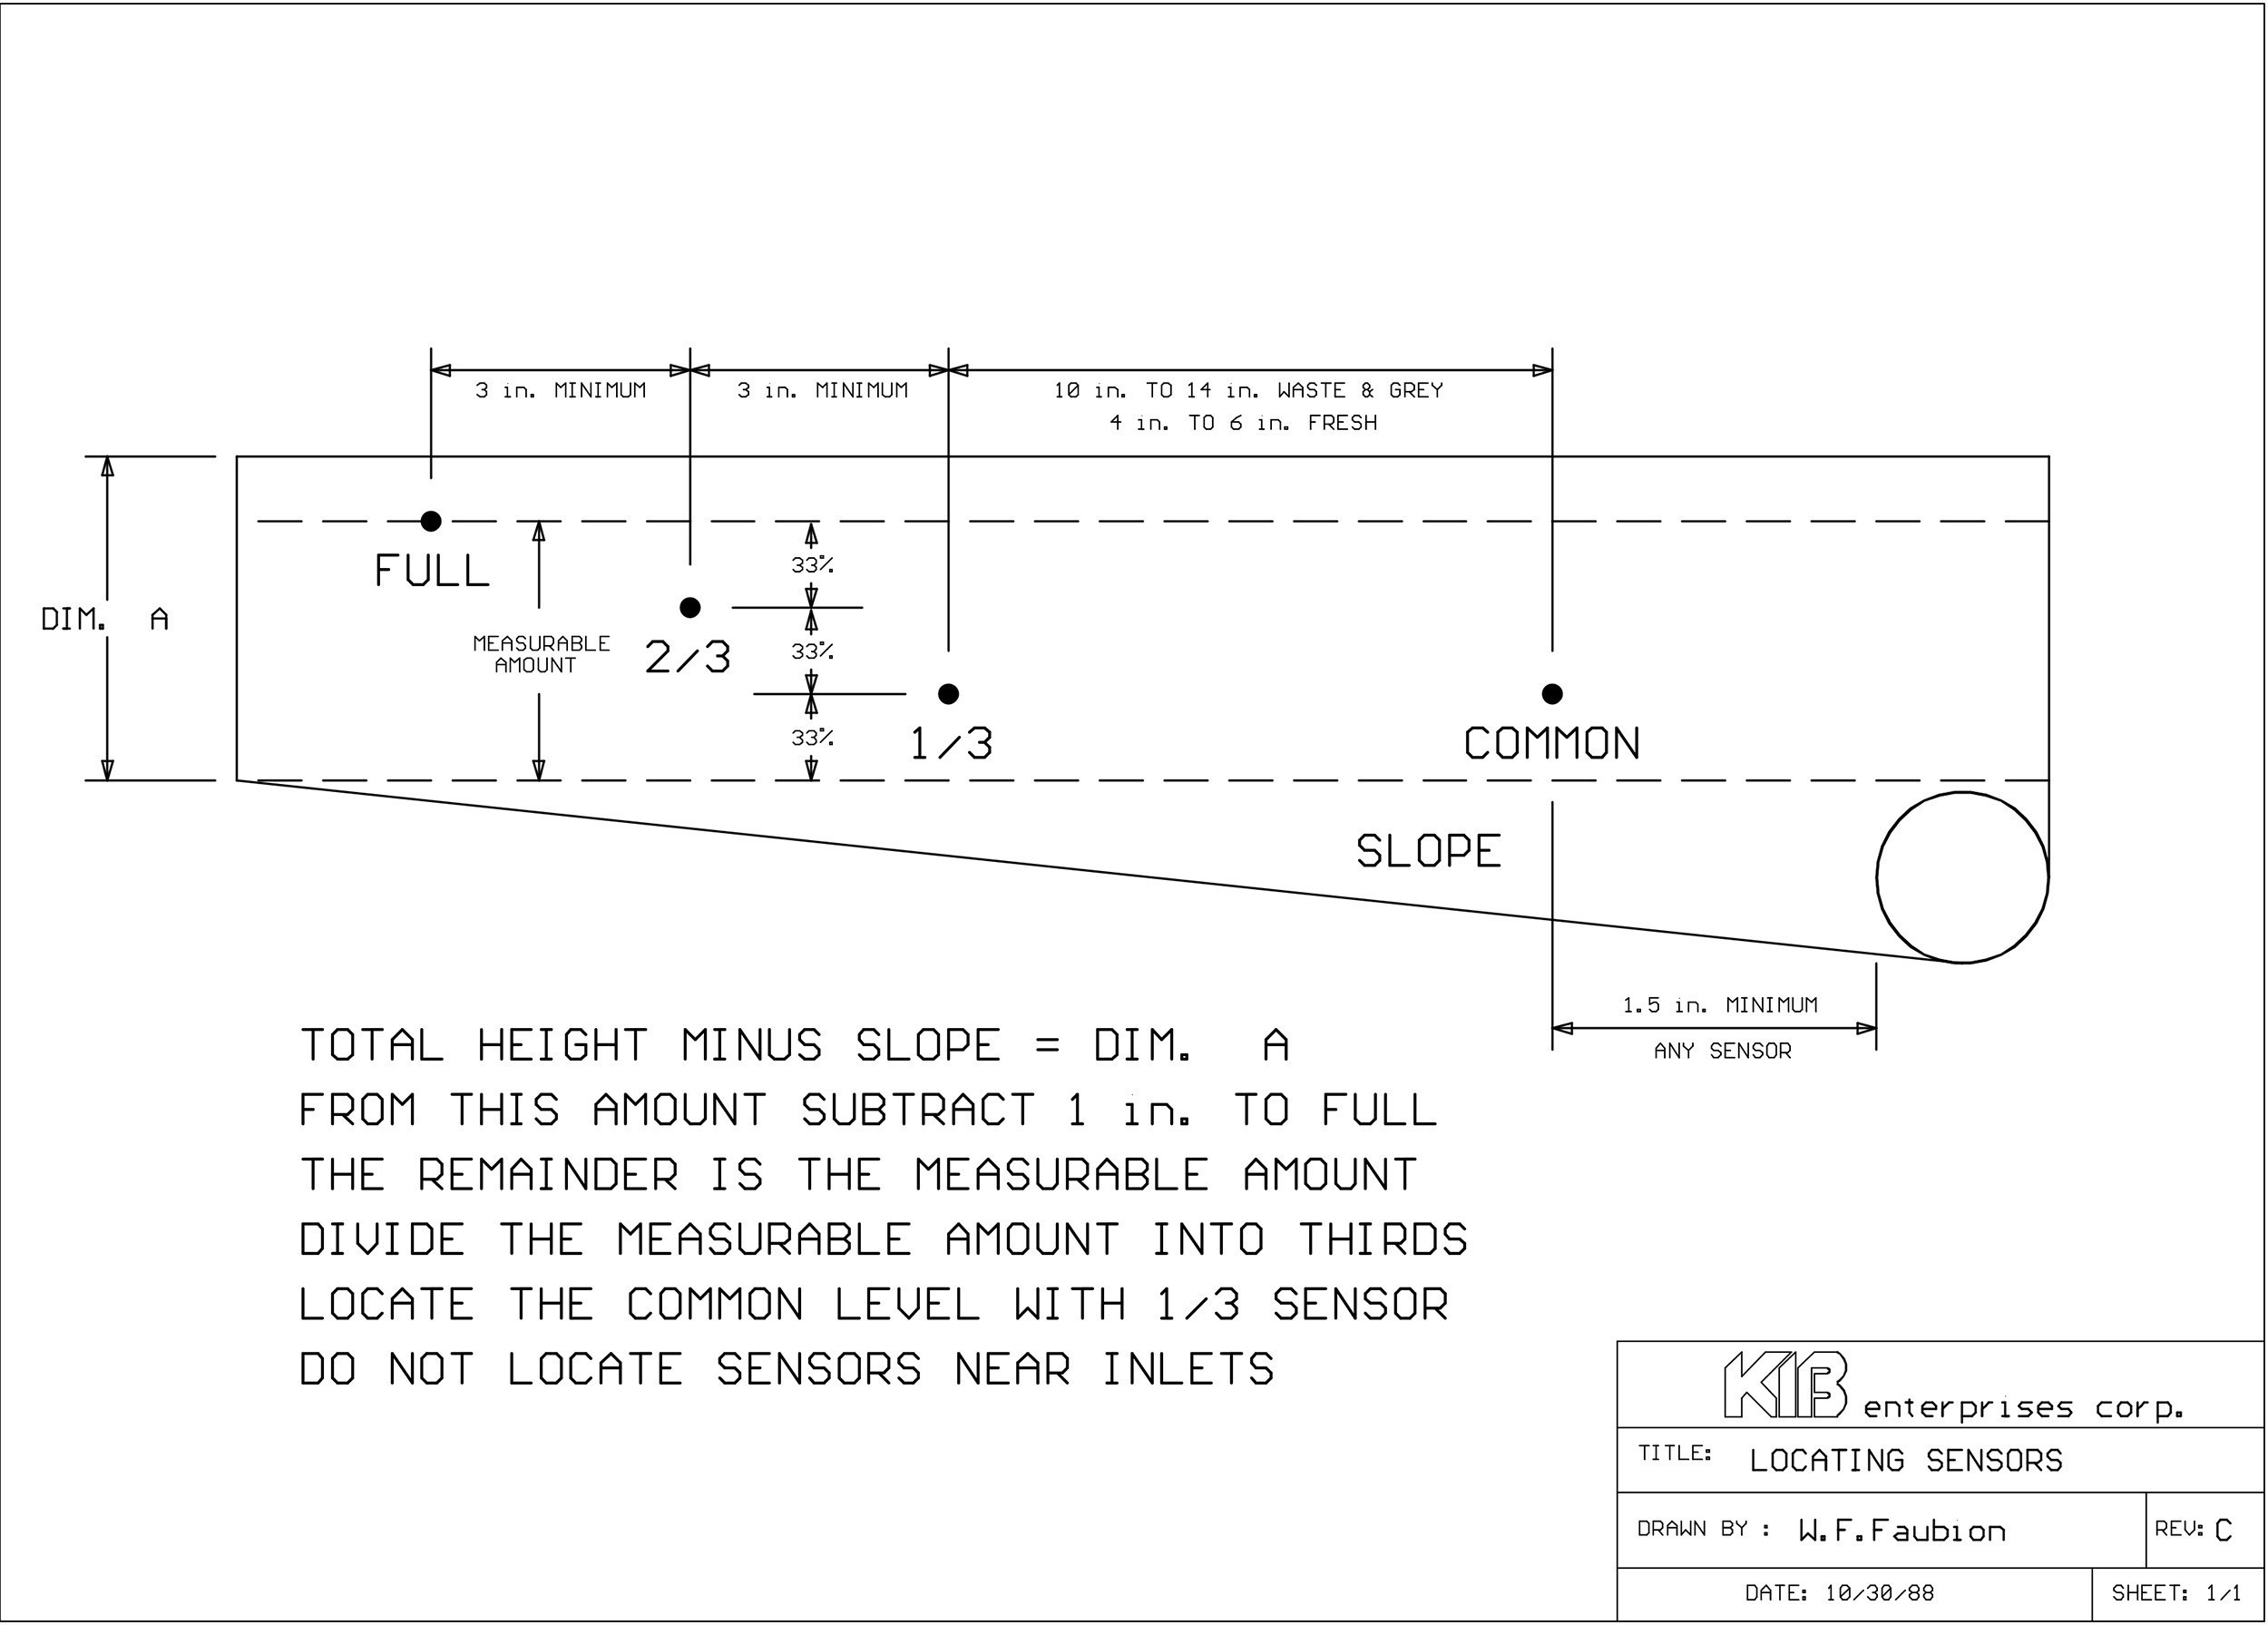 Kib Micro Monitor Panel Instructions 172 Jrv Monitor Panel Wiring Diagram Of Kib Micro Monitor Panel Instructions